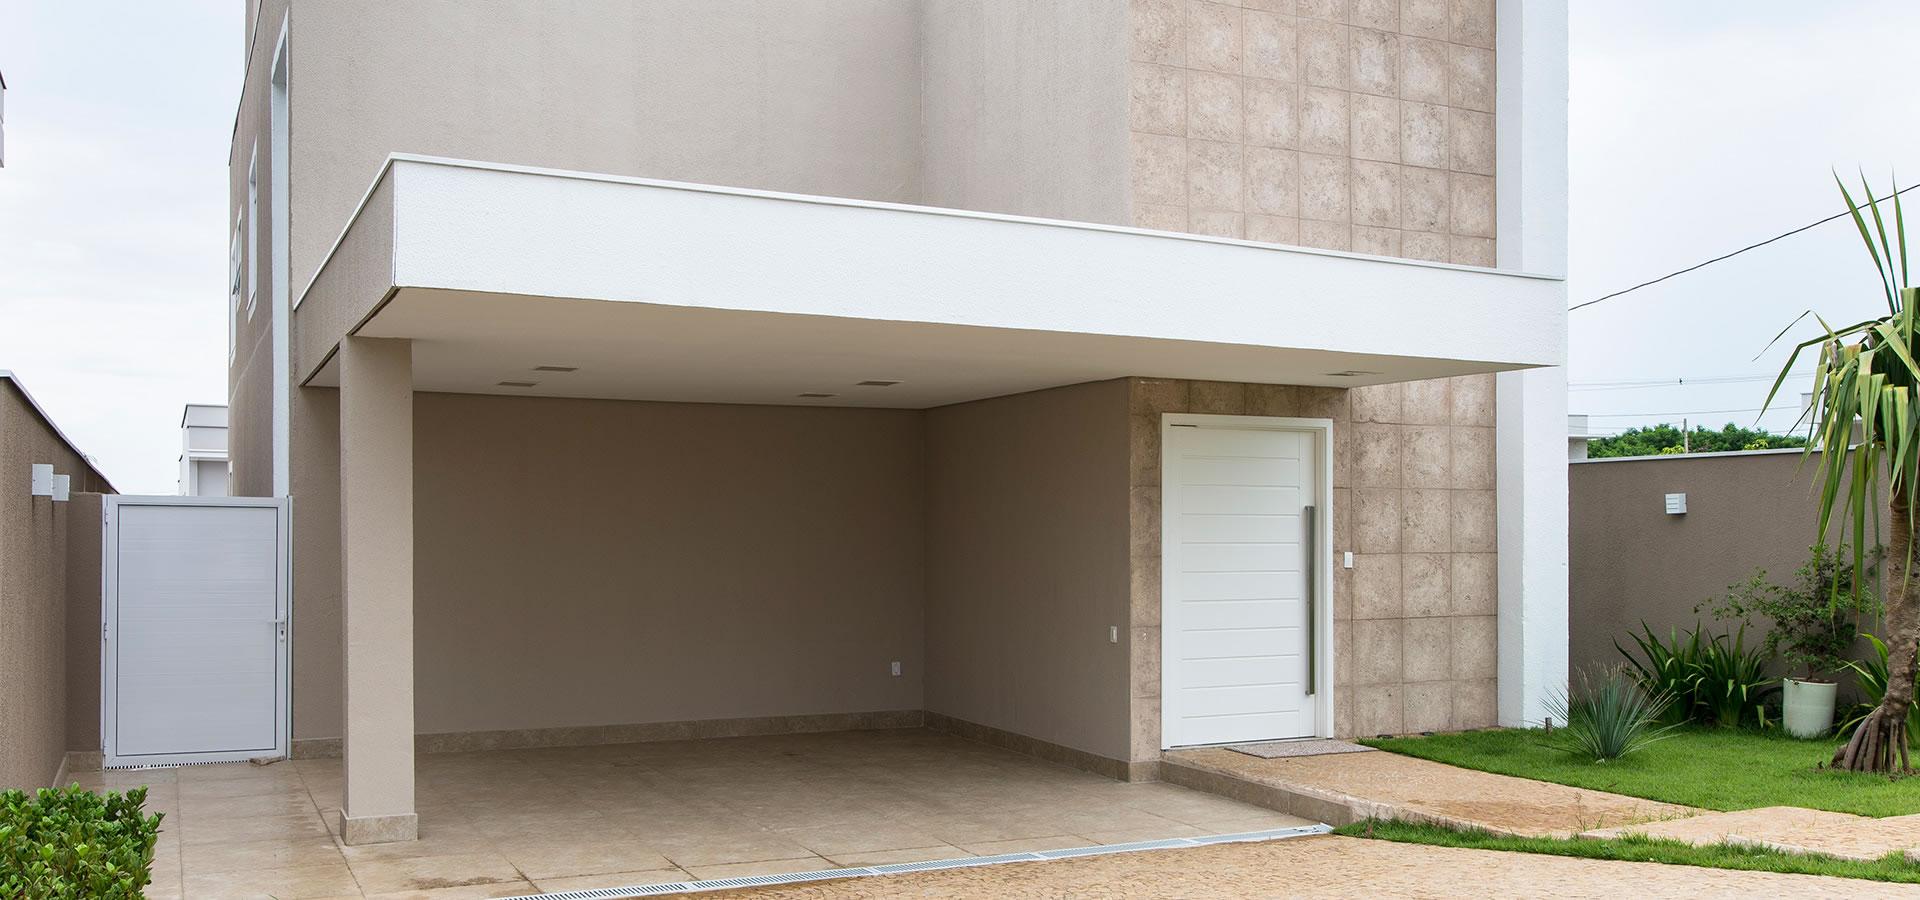 mg_banner_casa_fachada